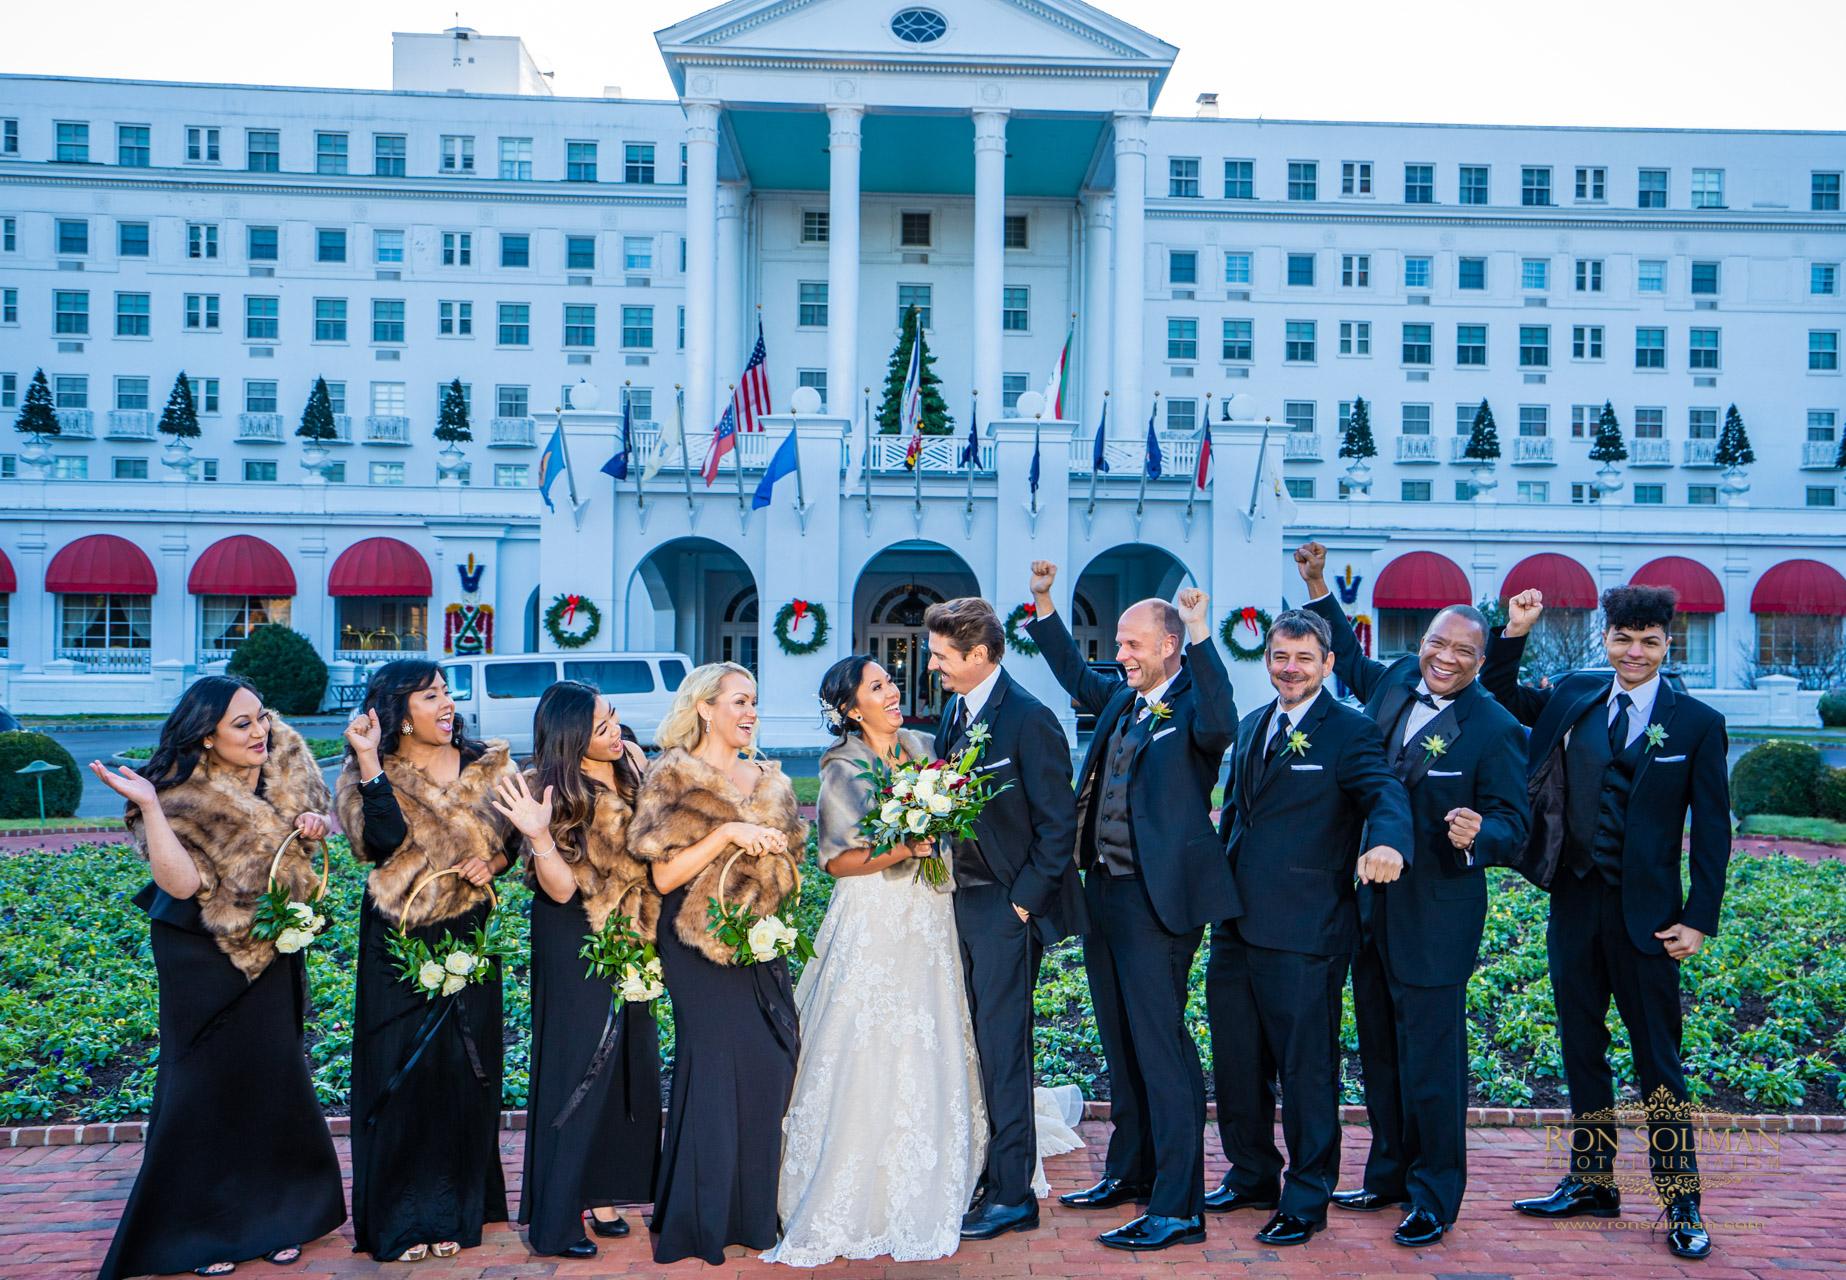 THE GREENBRIER RESORT WEDDING 20